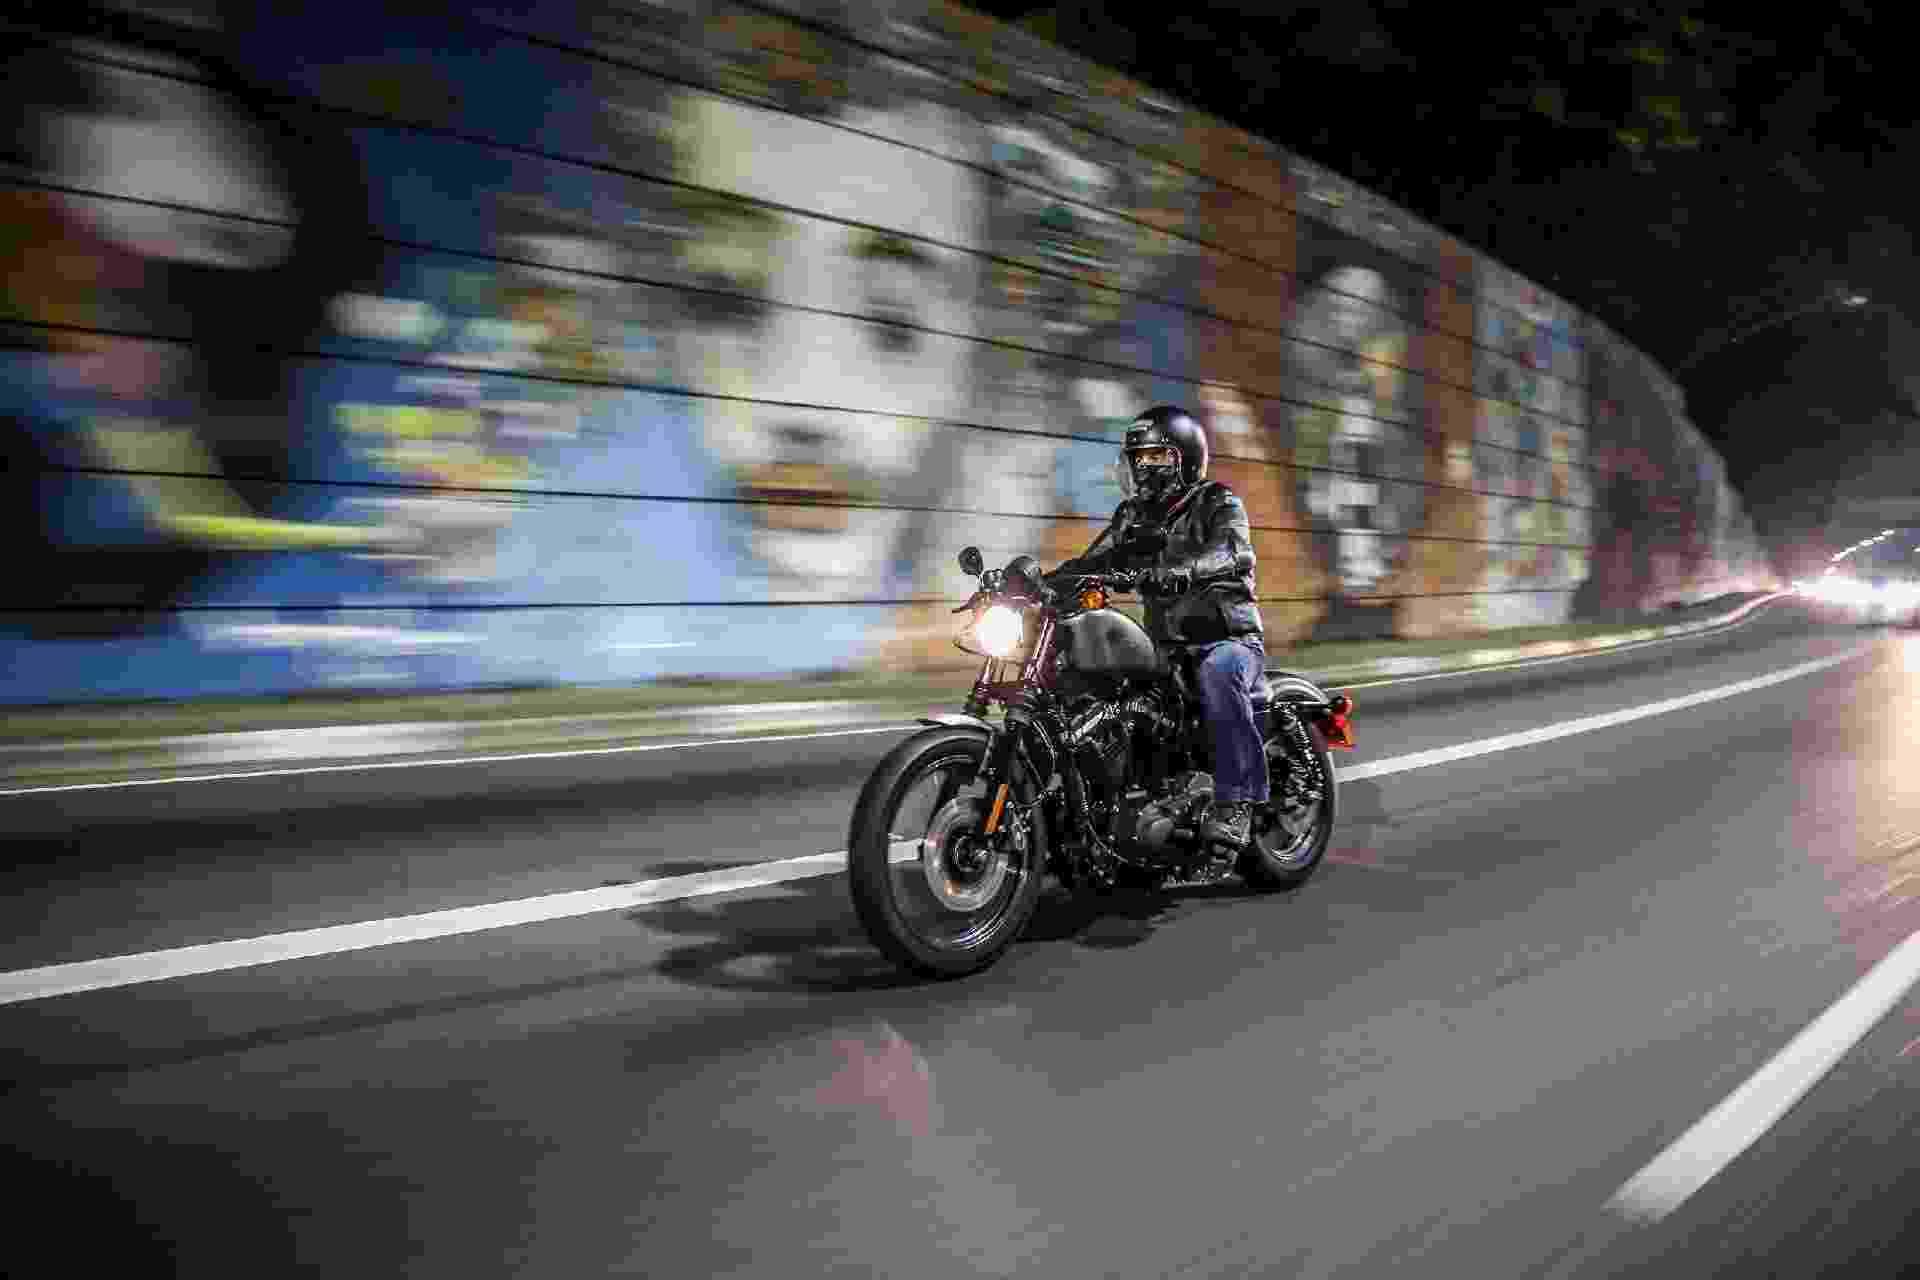 Harley-Davidson Iron 883 em São Paulo - Renato Durães/Infomoto